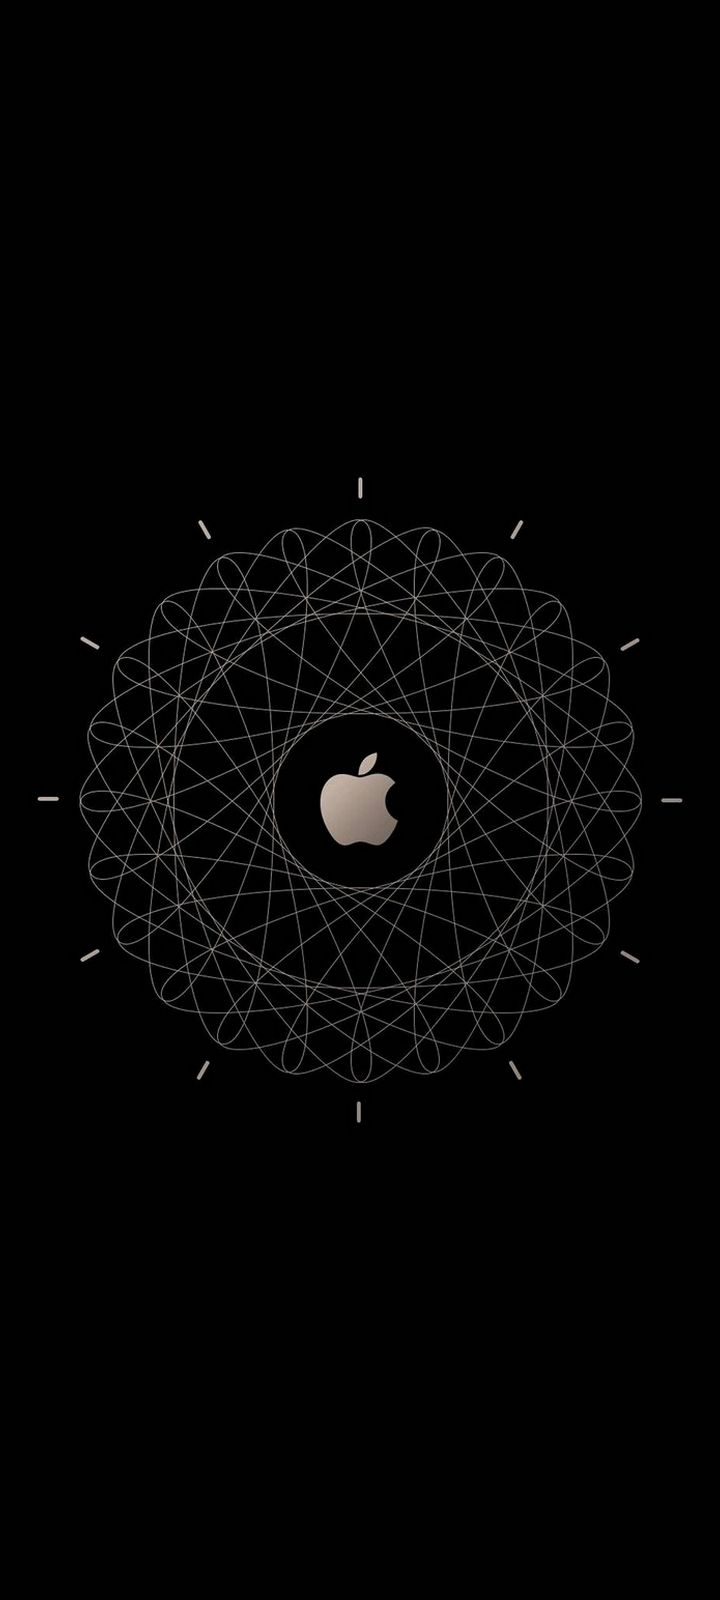 Apple Logo Brown Technology Wallpaper 720x1600